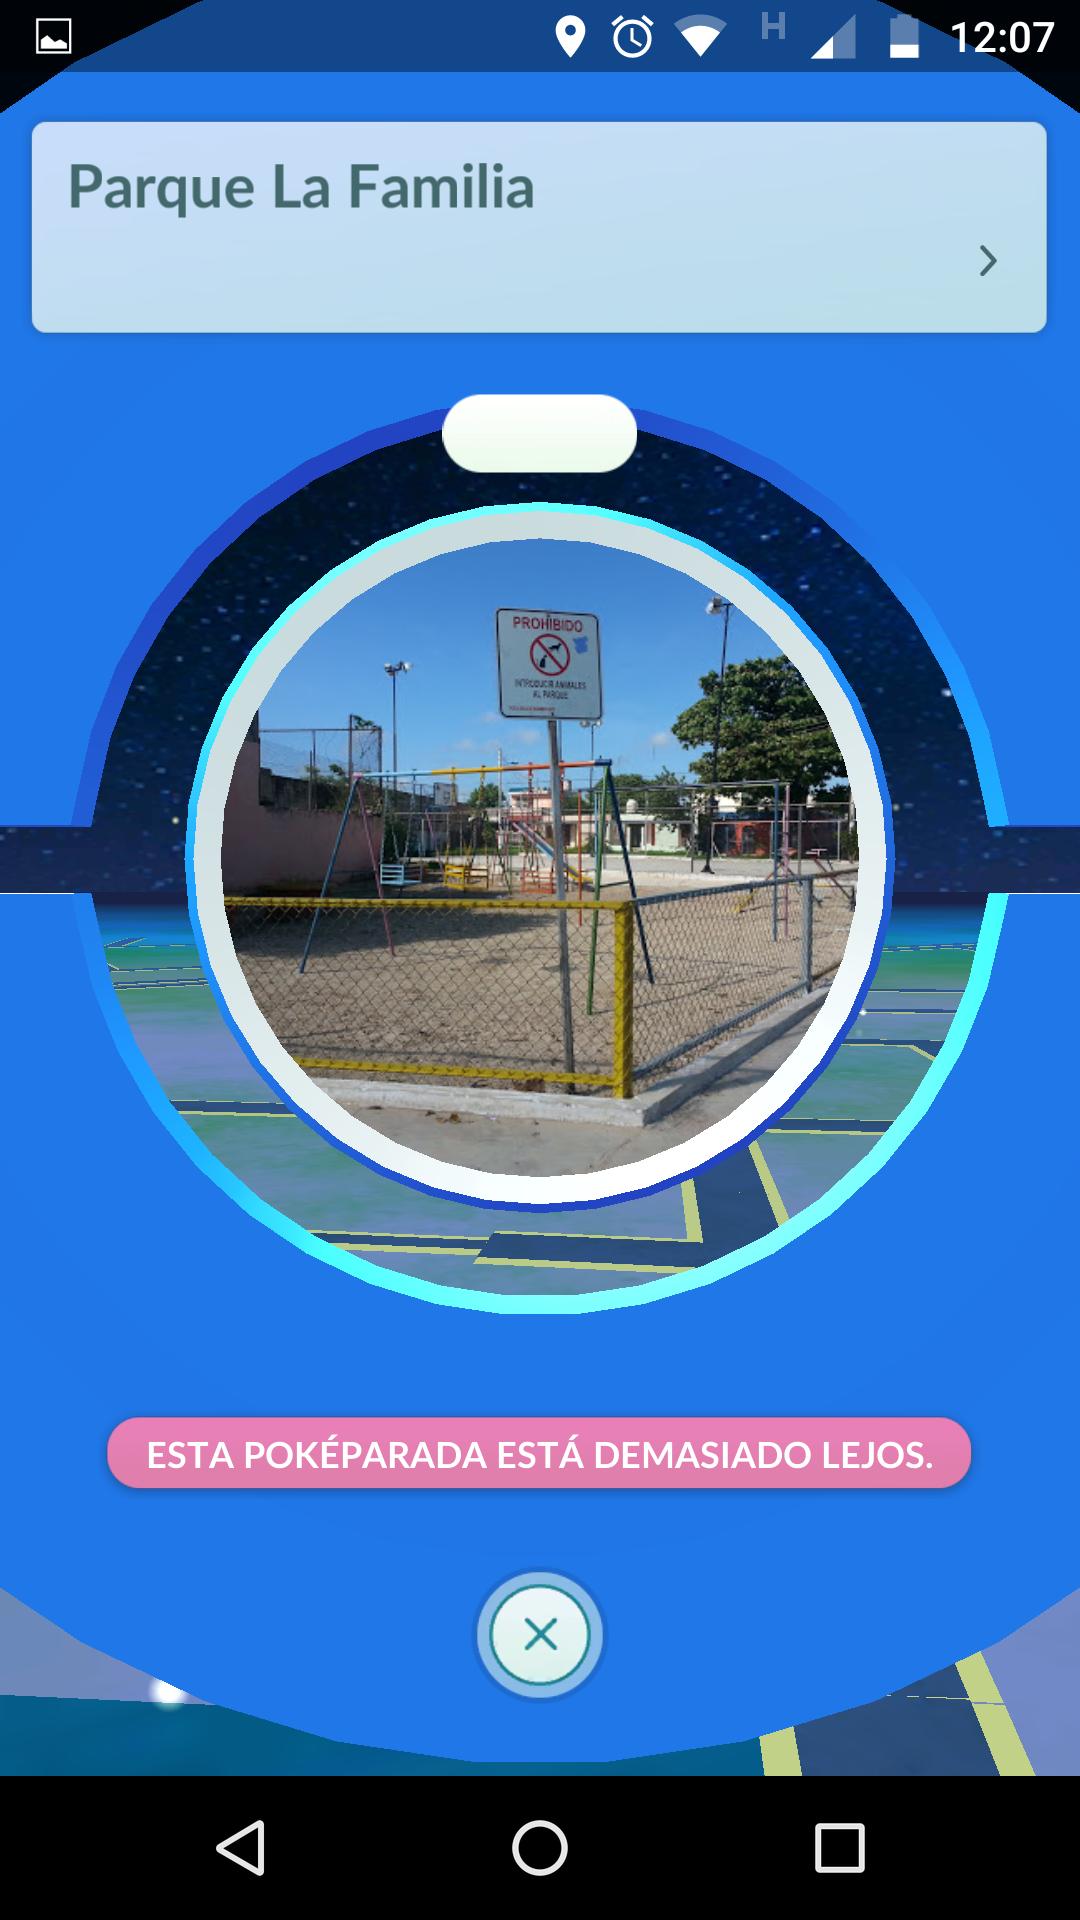 Descarga Pokemon Go disponible Android Mexico Latam (5)